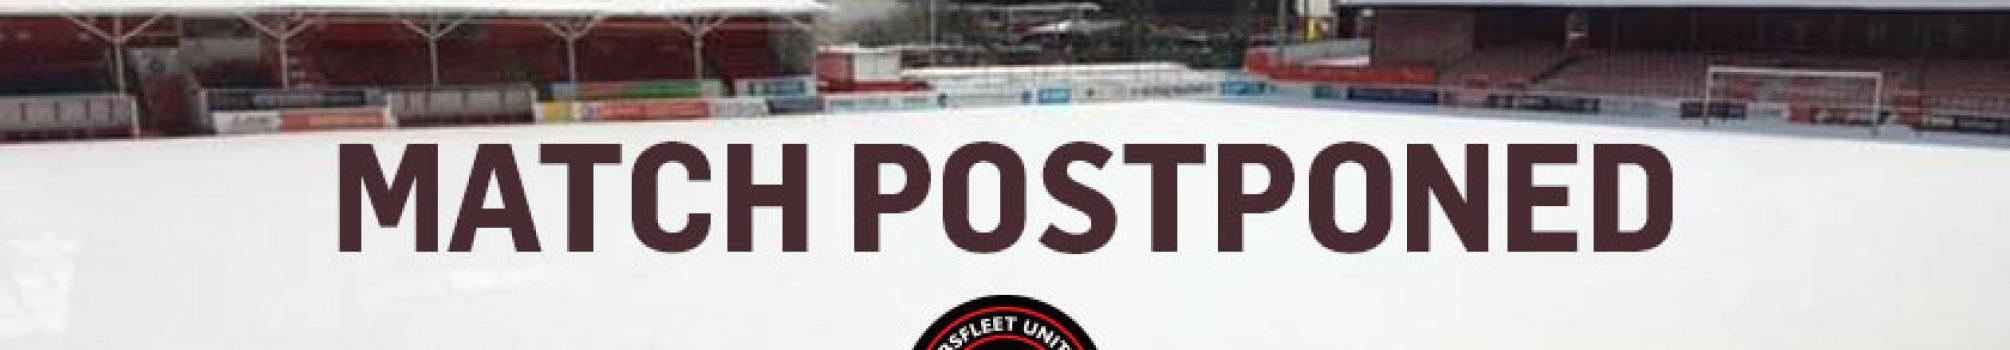 snow-postponed